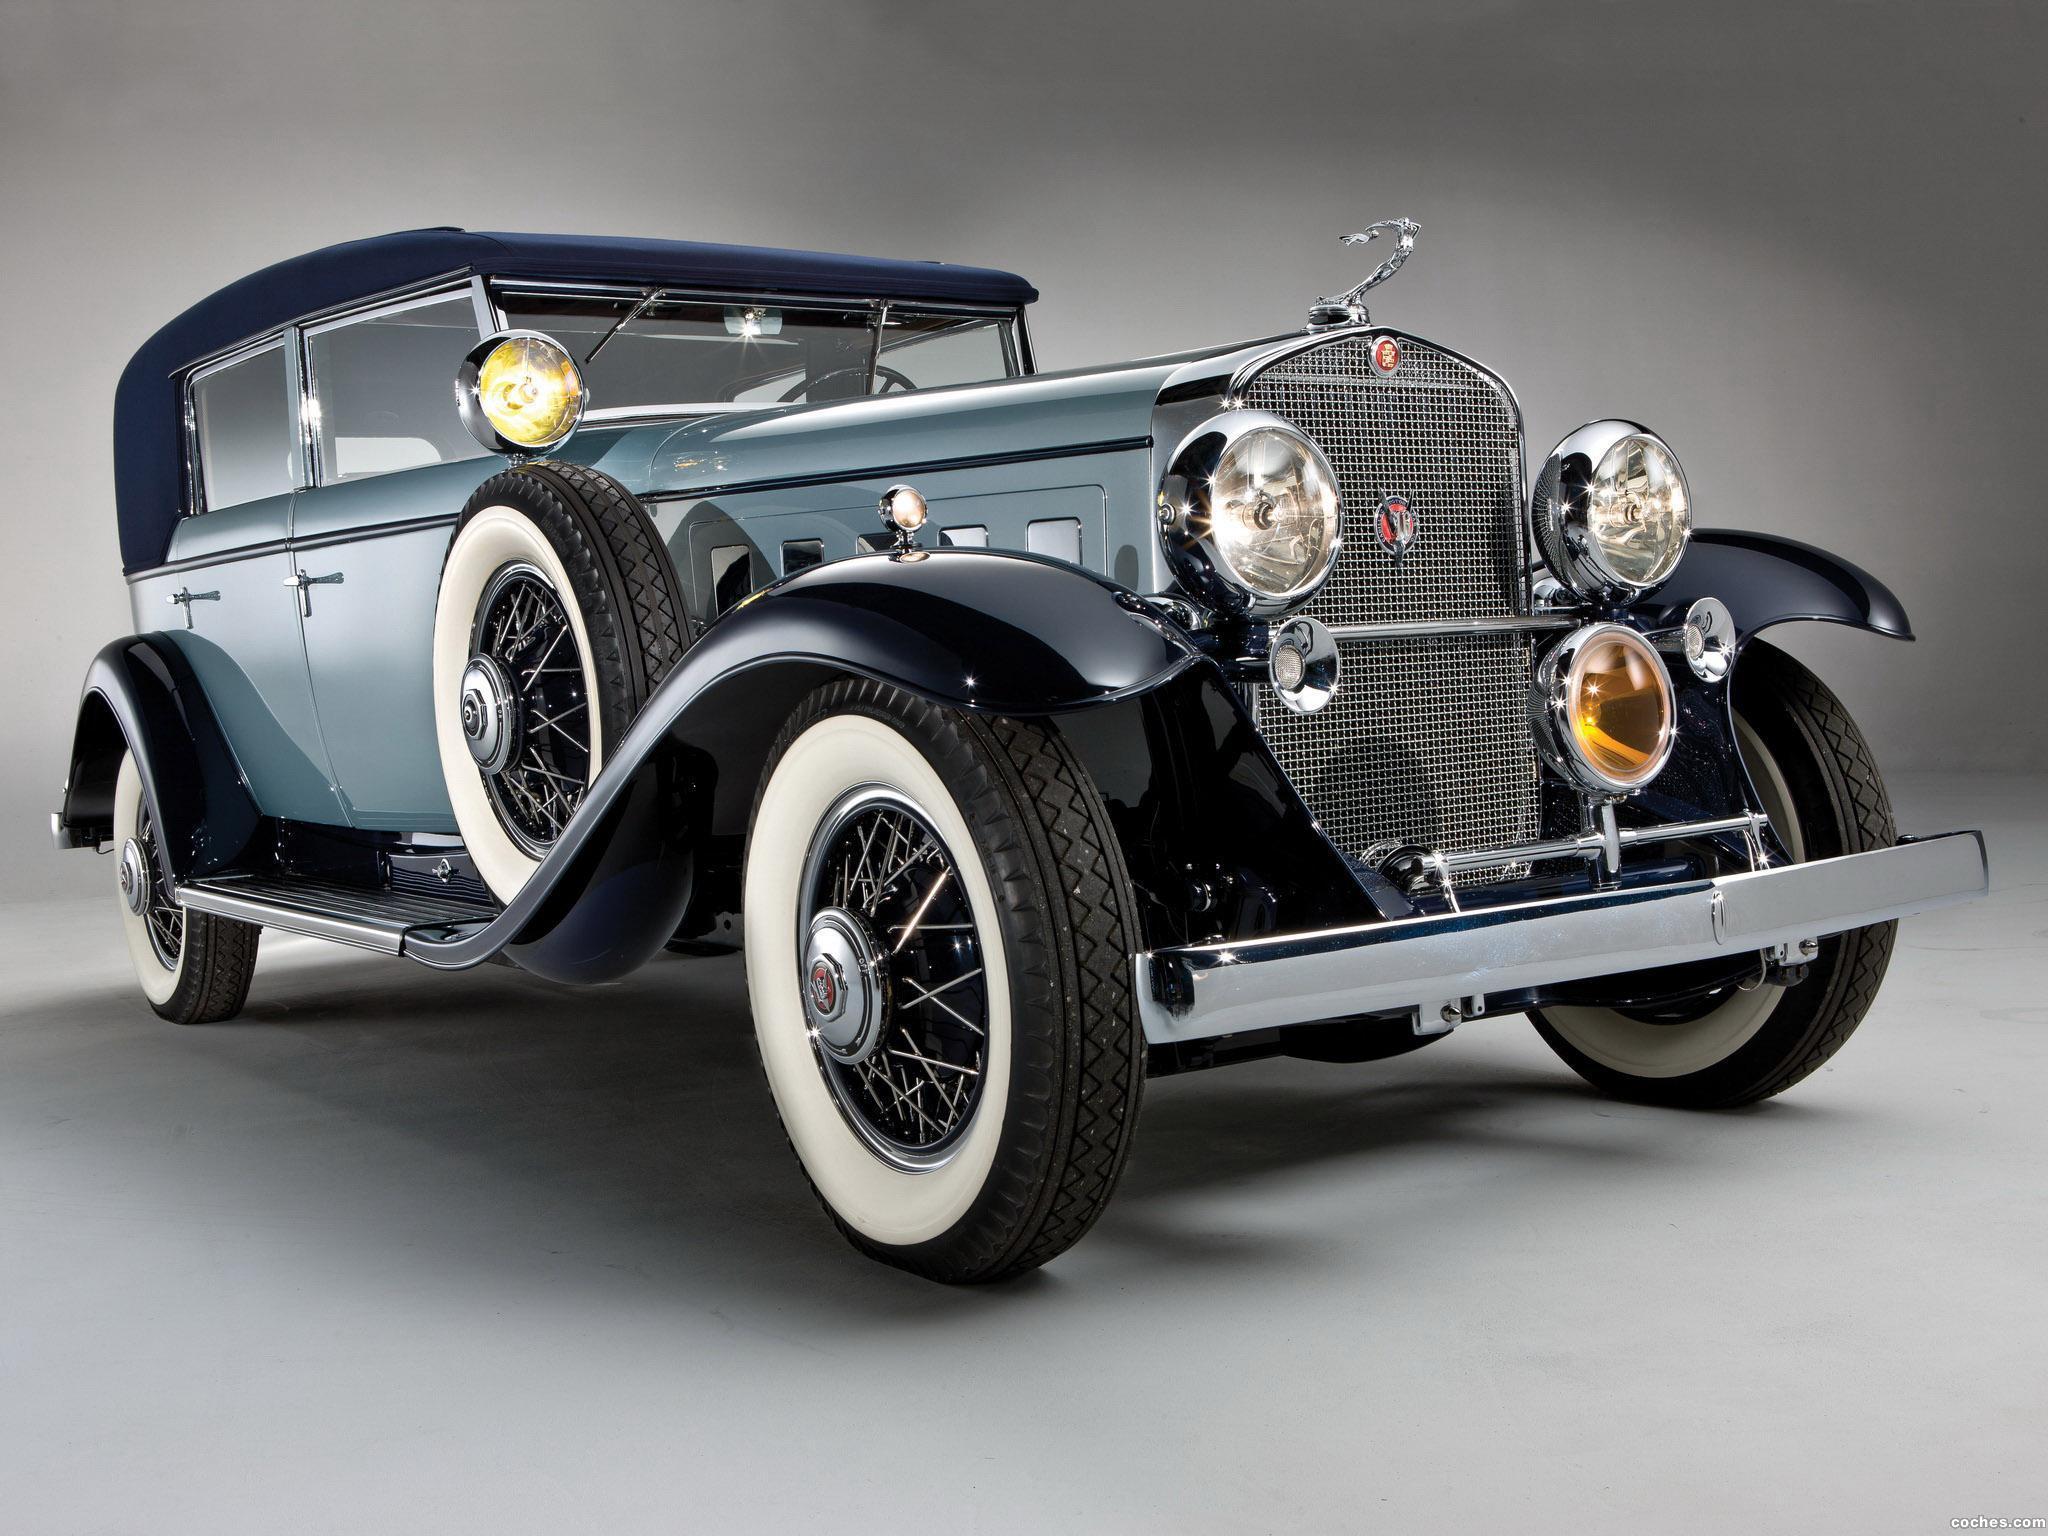 Foto 0 de Cadillac Sixteen v16 Convertible Sedan by Saoutchik 1930